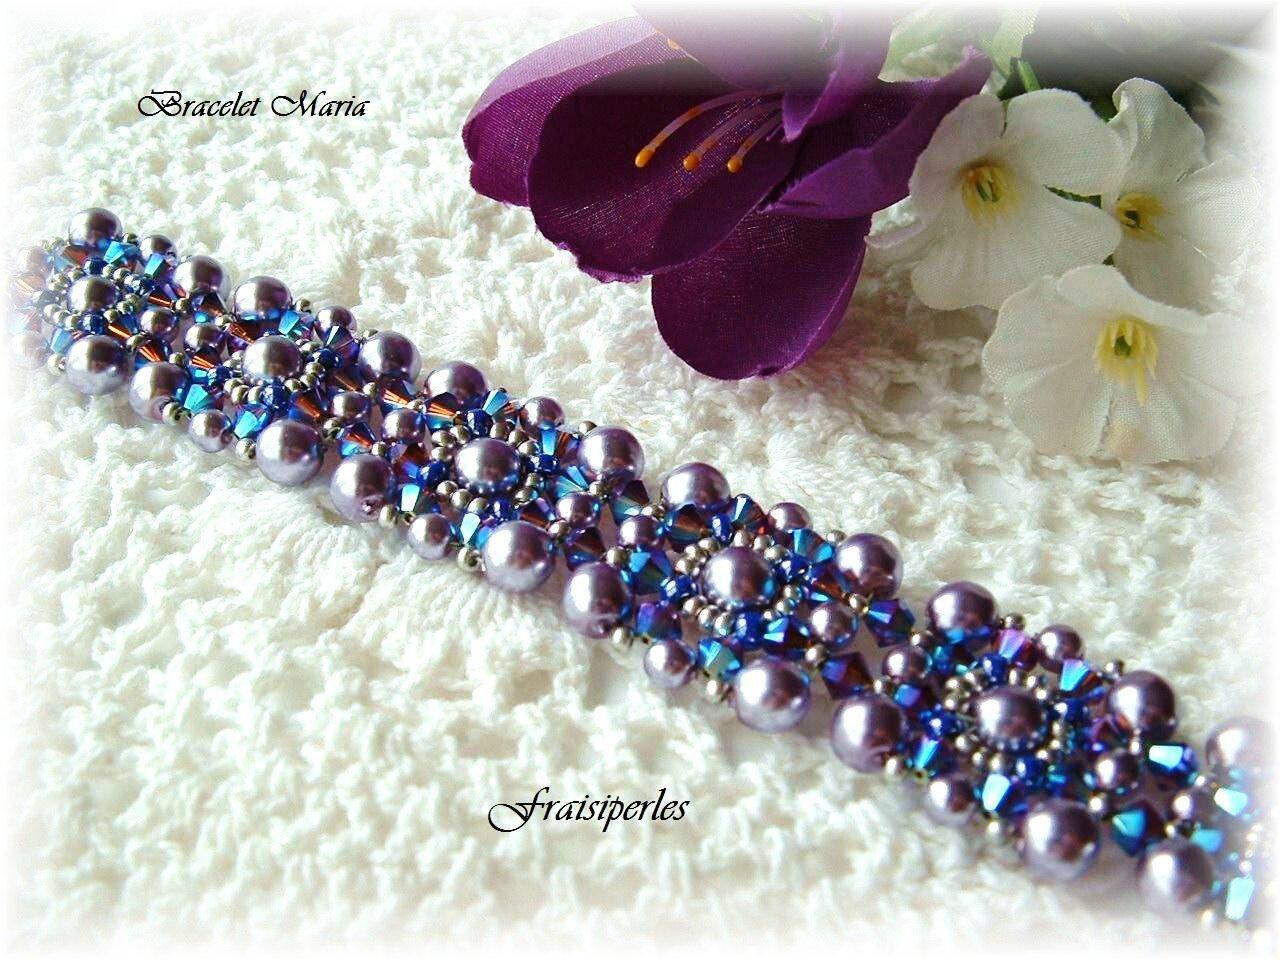 Bracelet Maria1